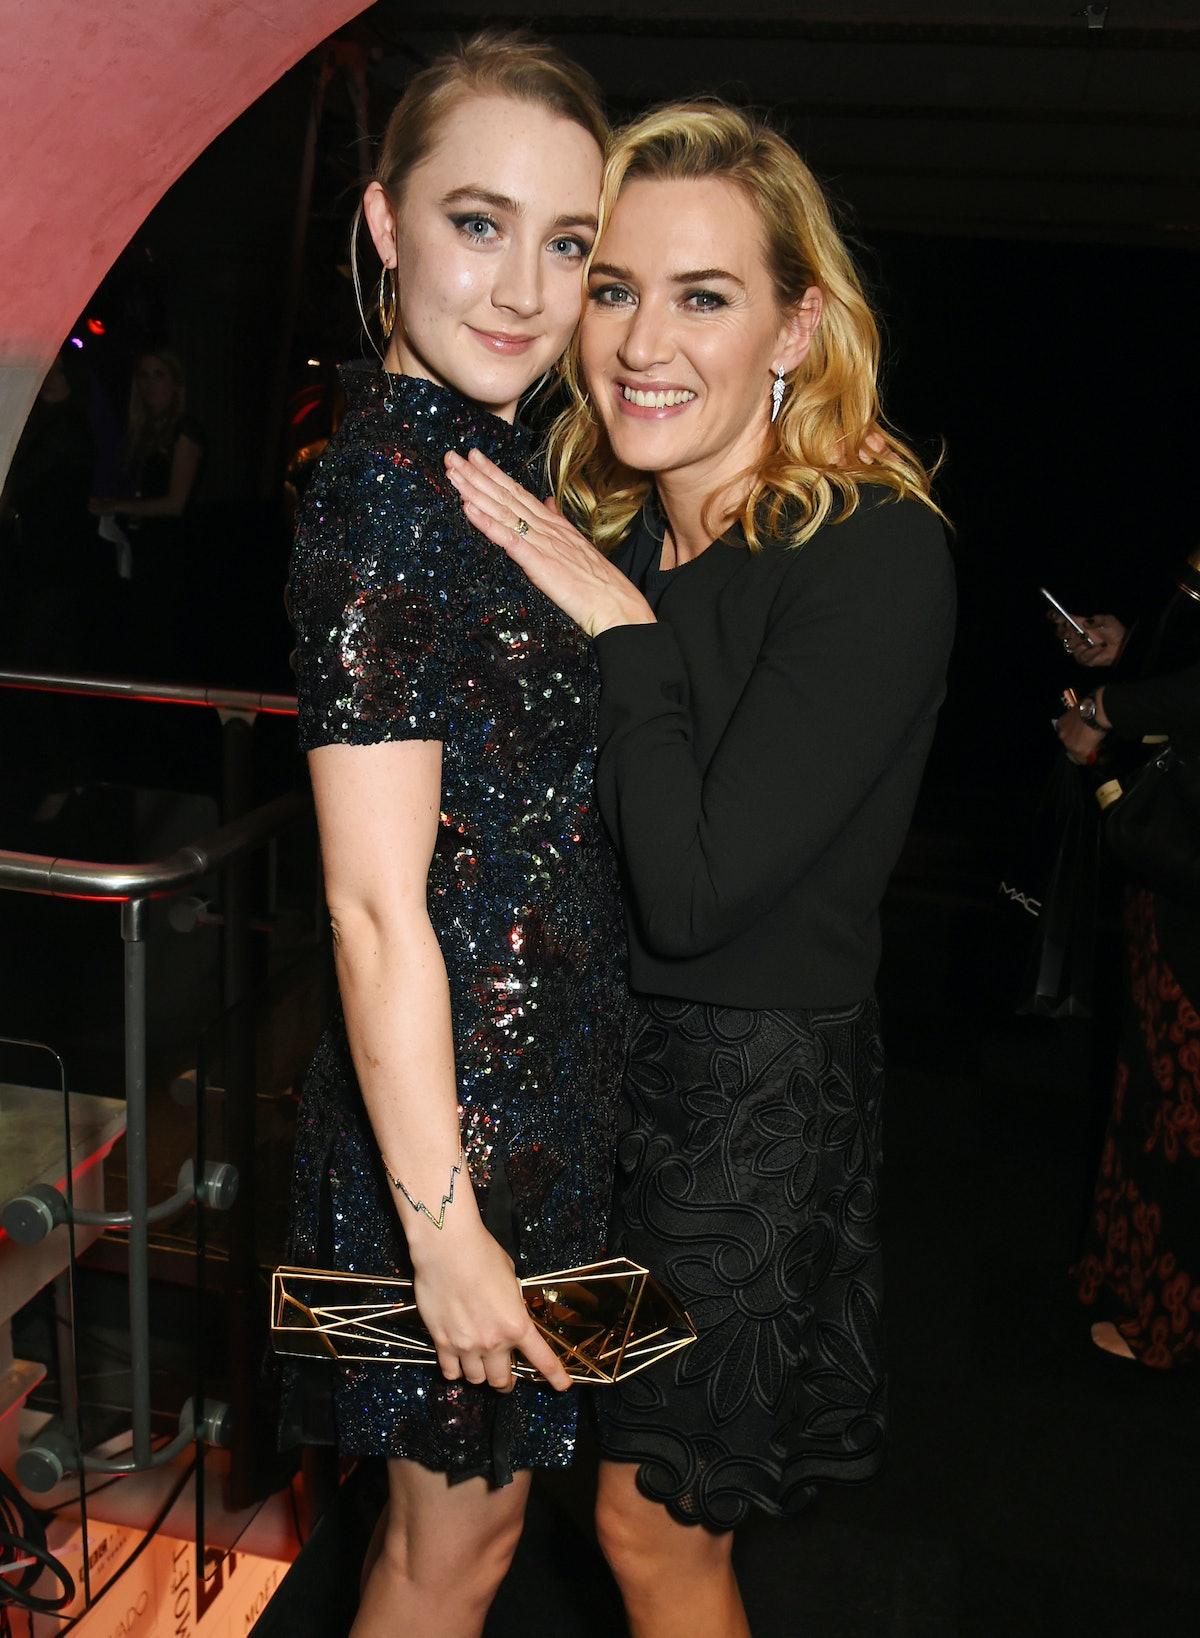 Saoirse Ronan and Kate Winslet